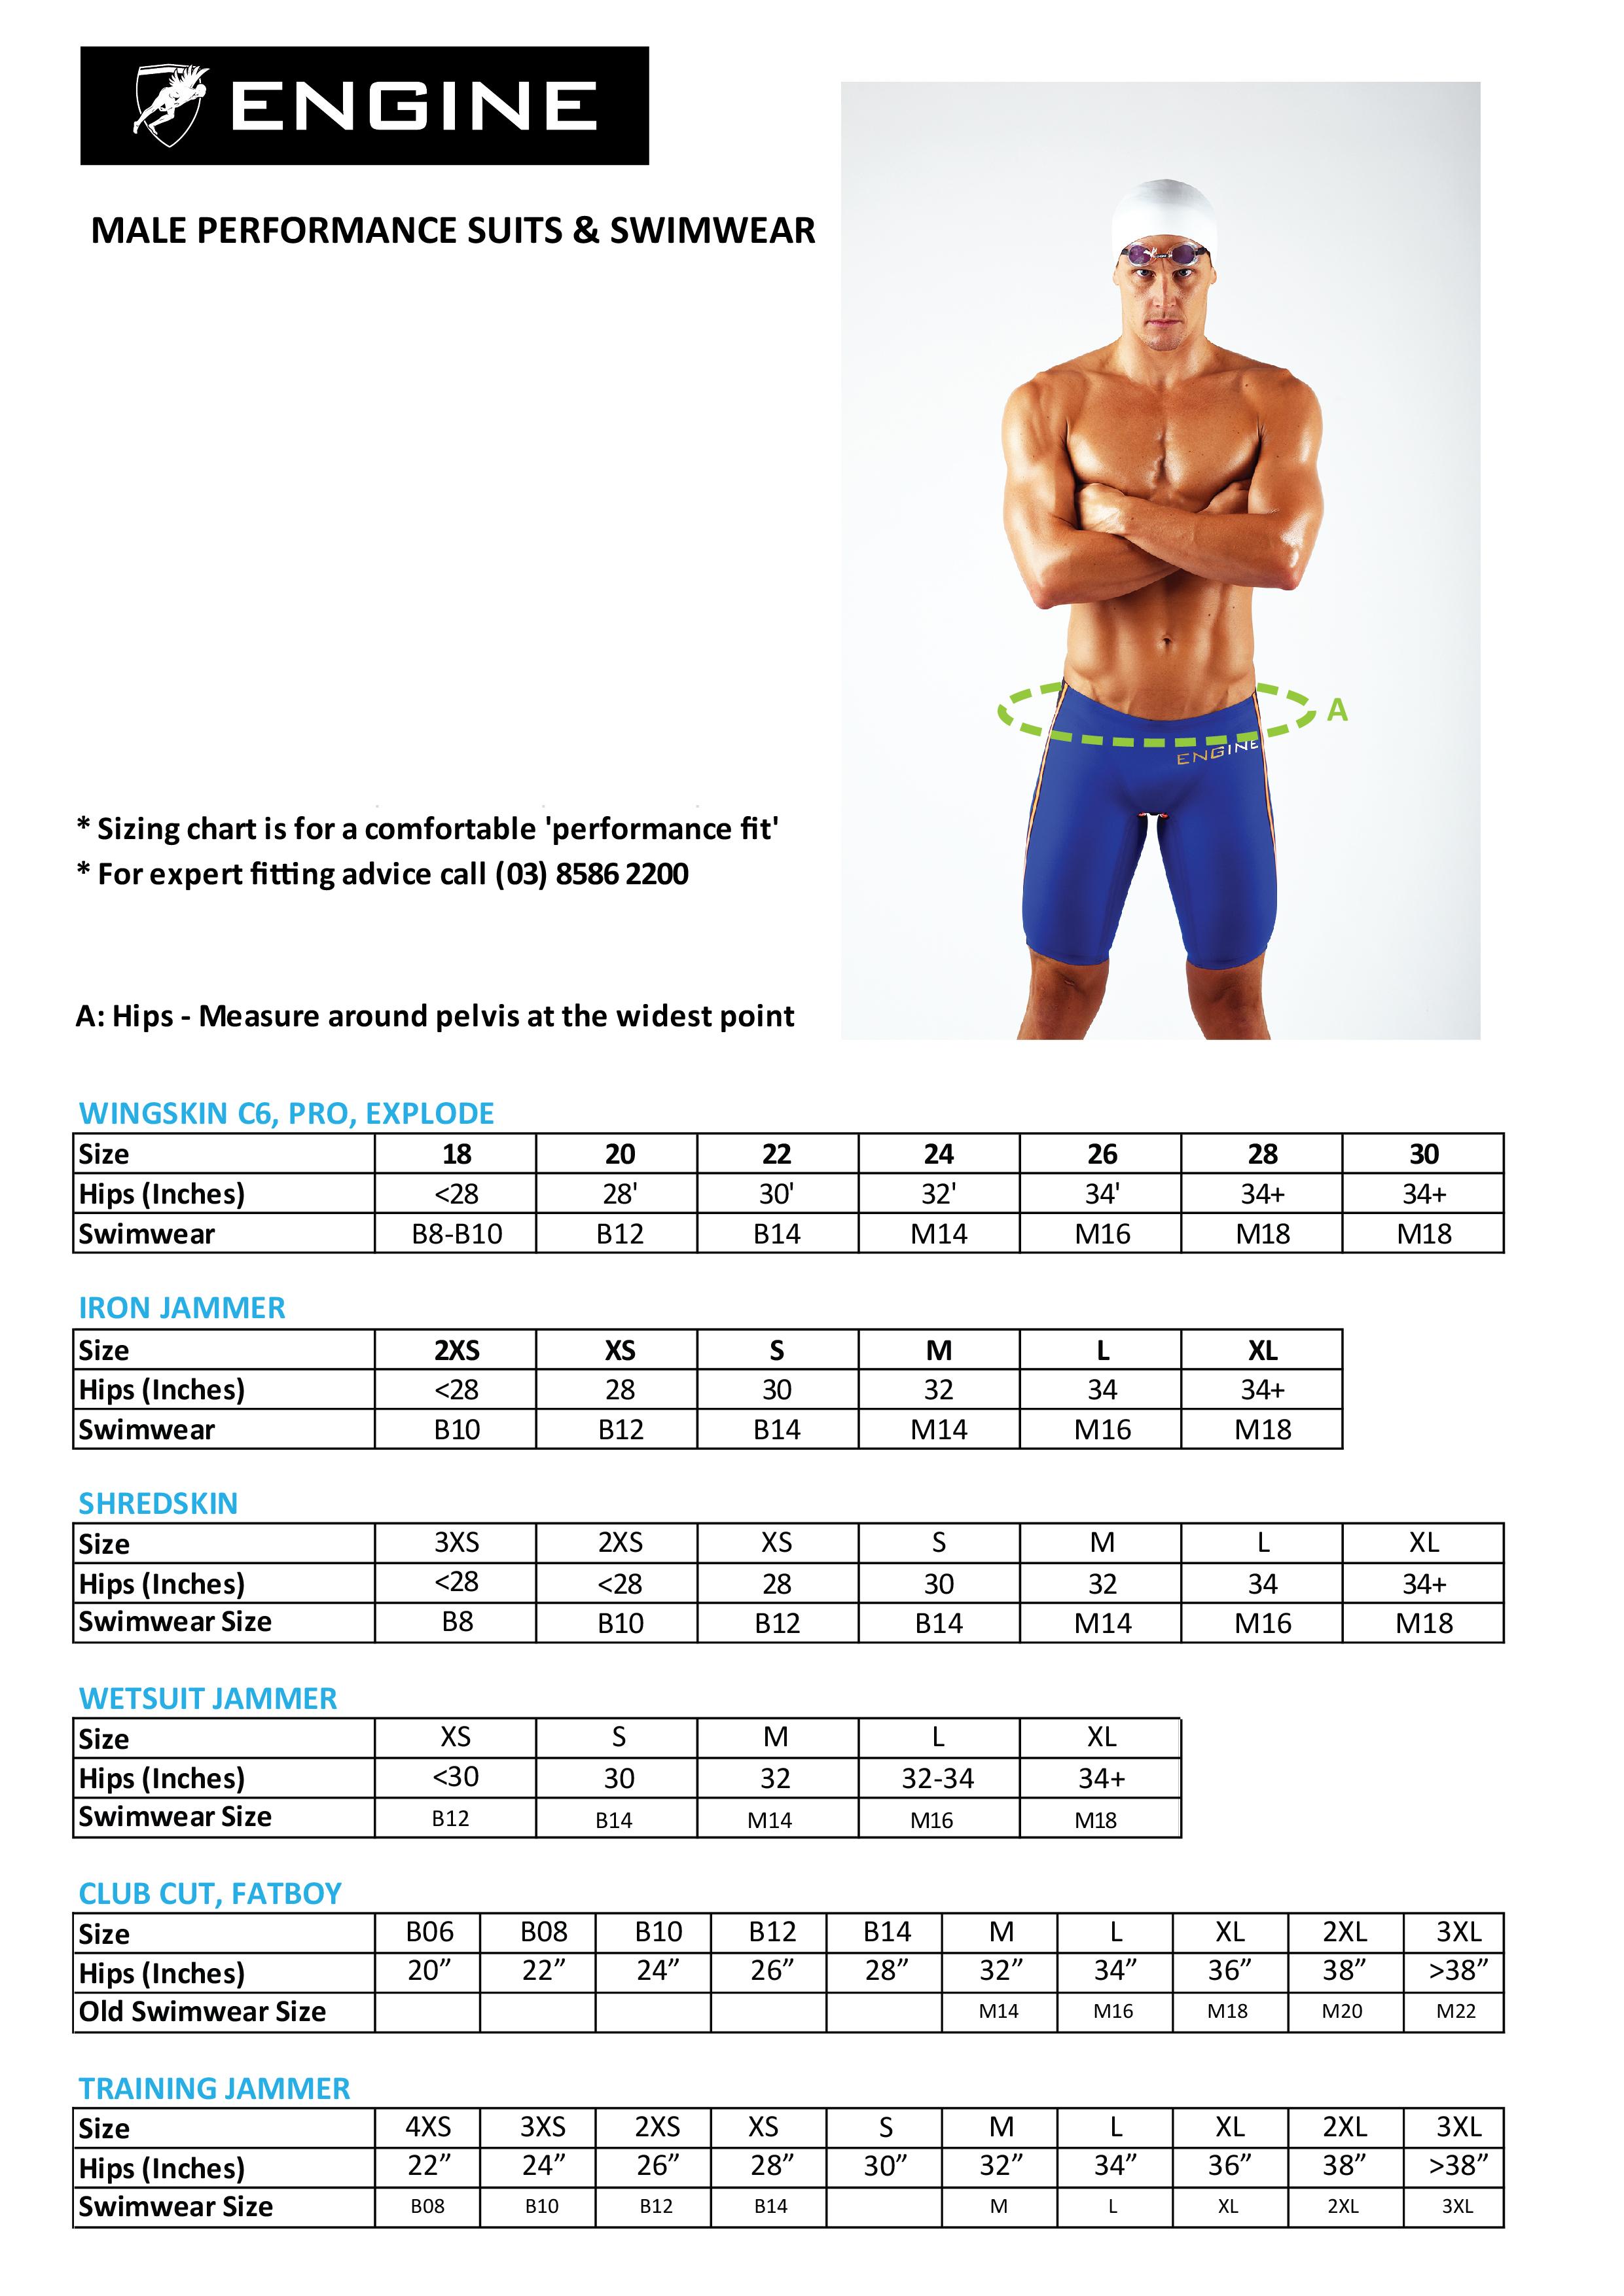 mens-swimwear-size-chart-2019-01-01.jpg